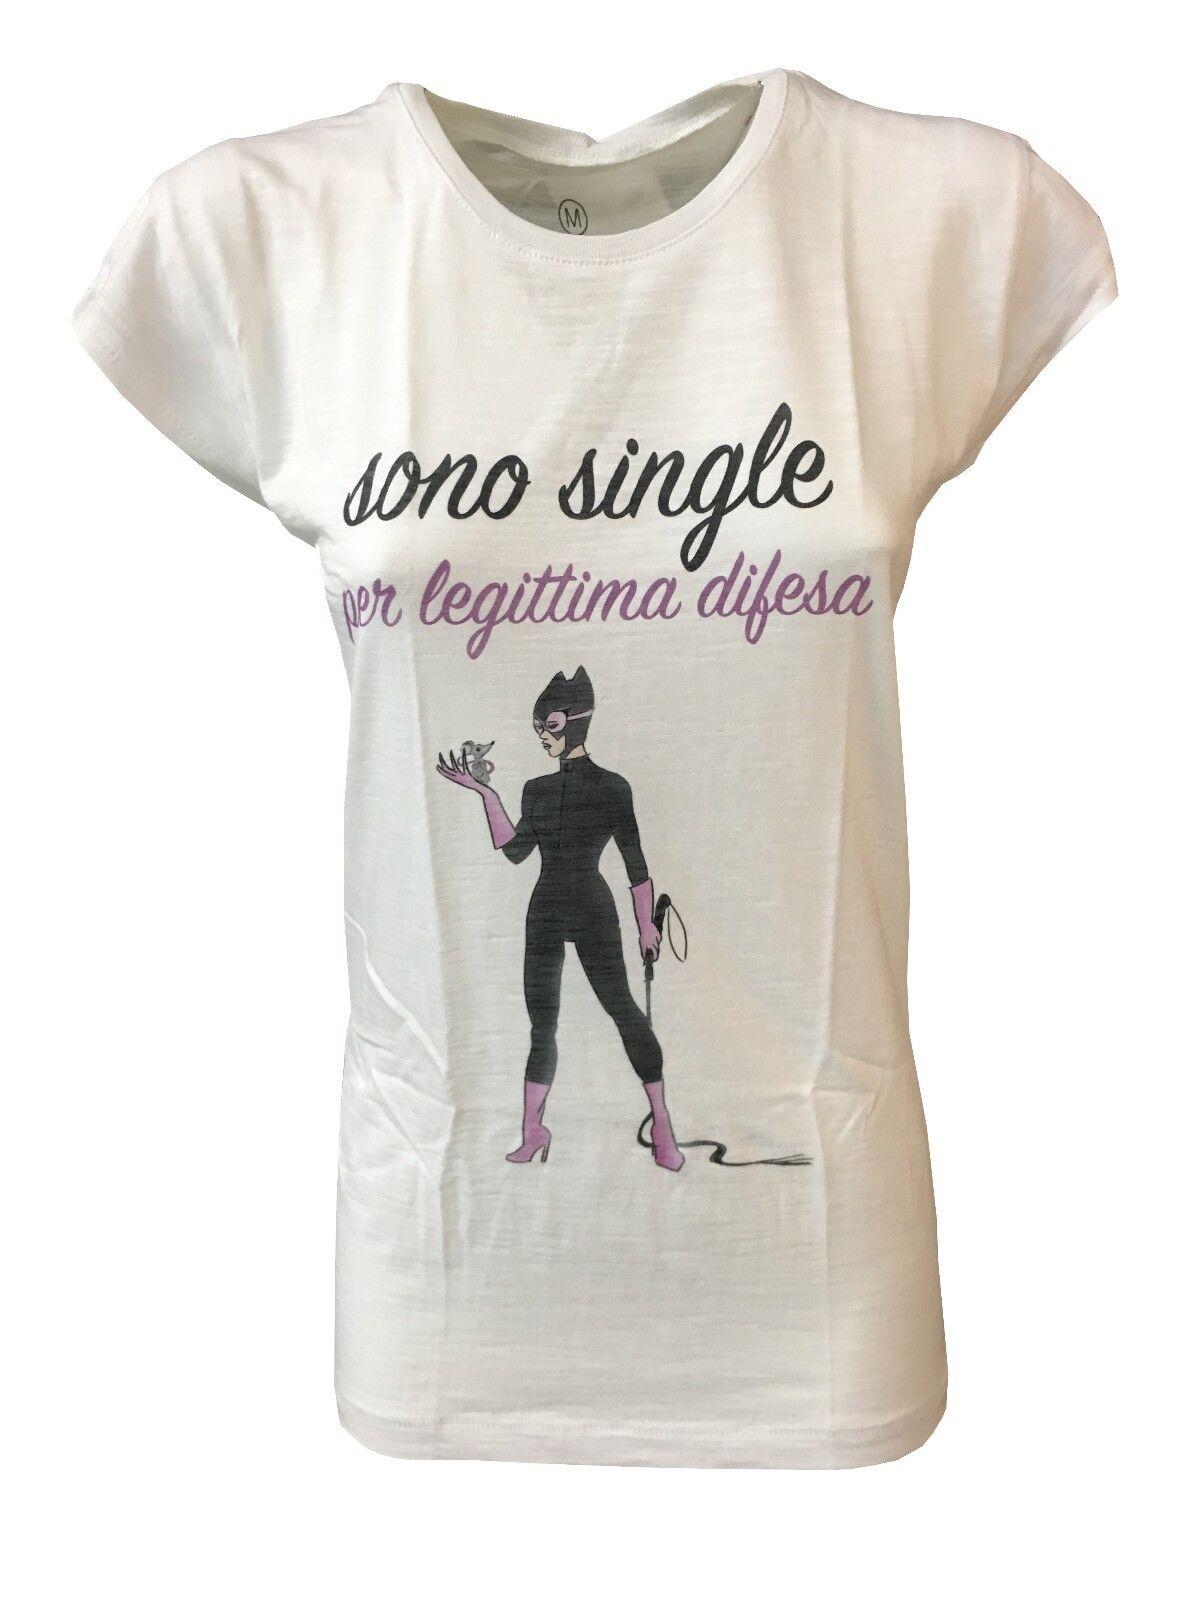 Tip&top Camiseta Mujer Media Manga en blancoo  Single 100% Algodón  primera vez respuesta